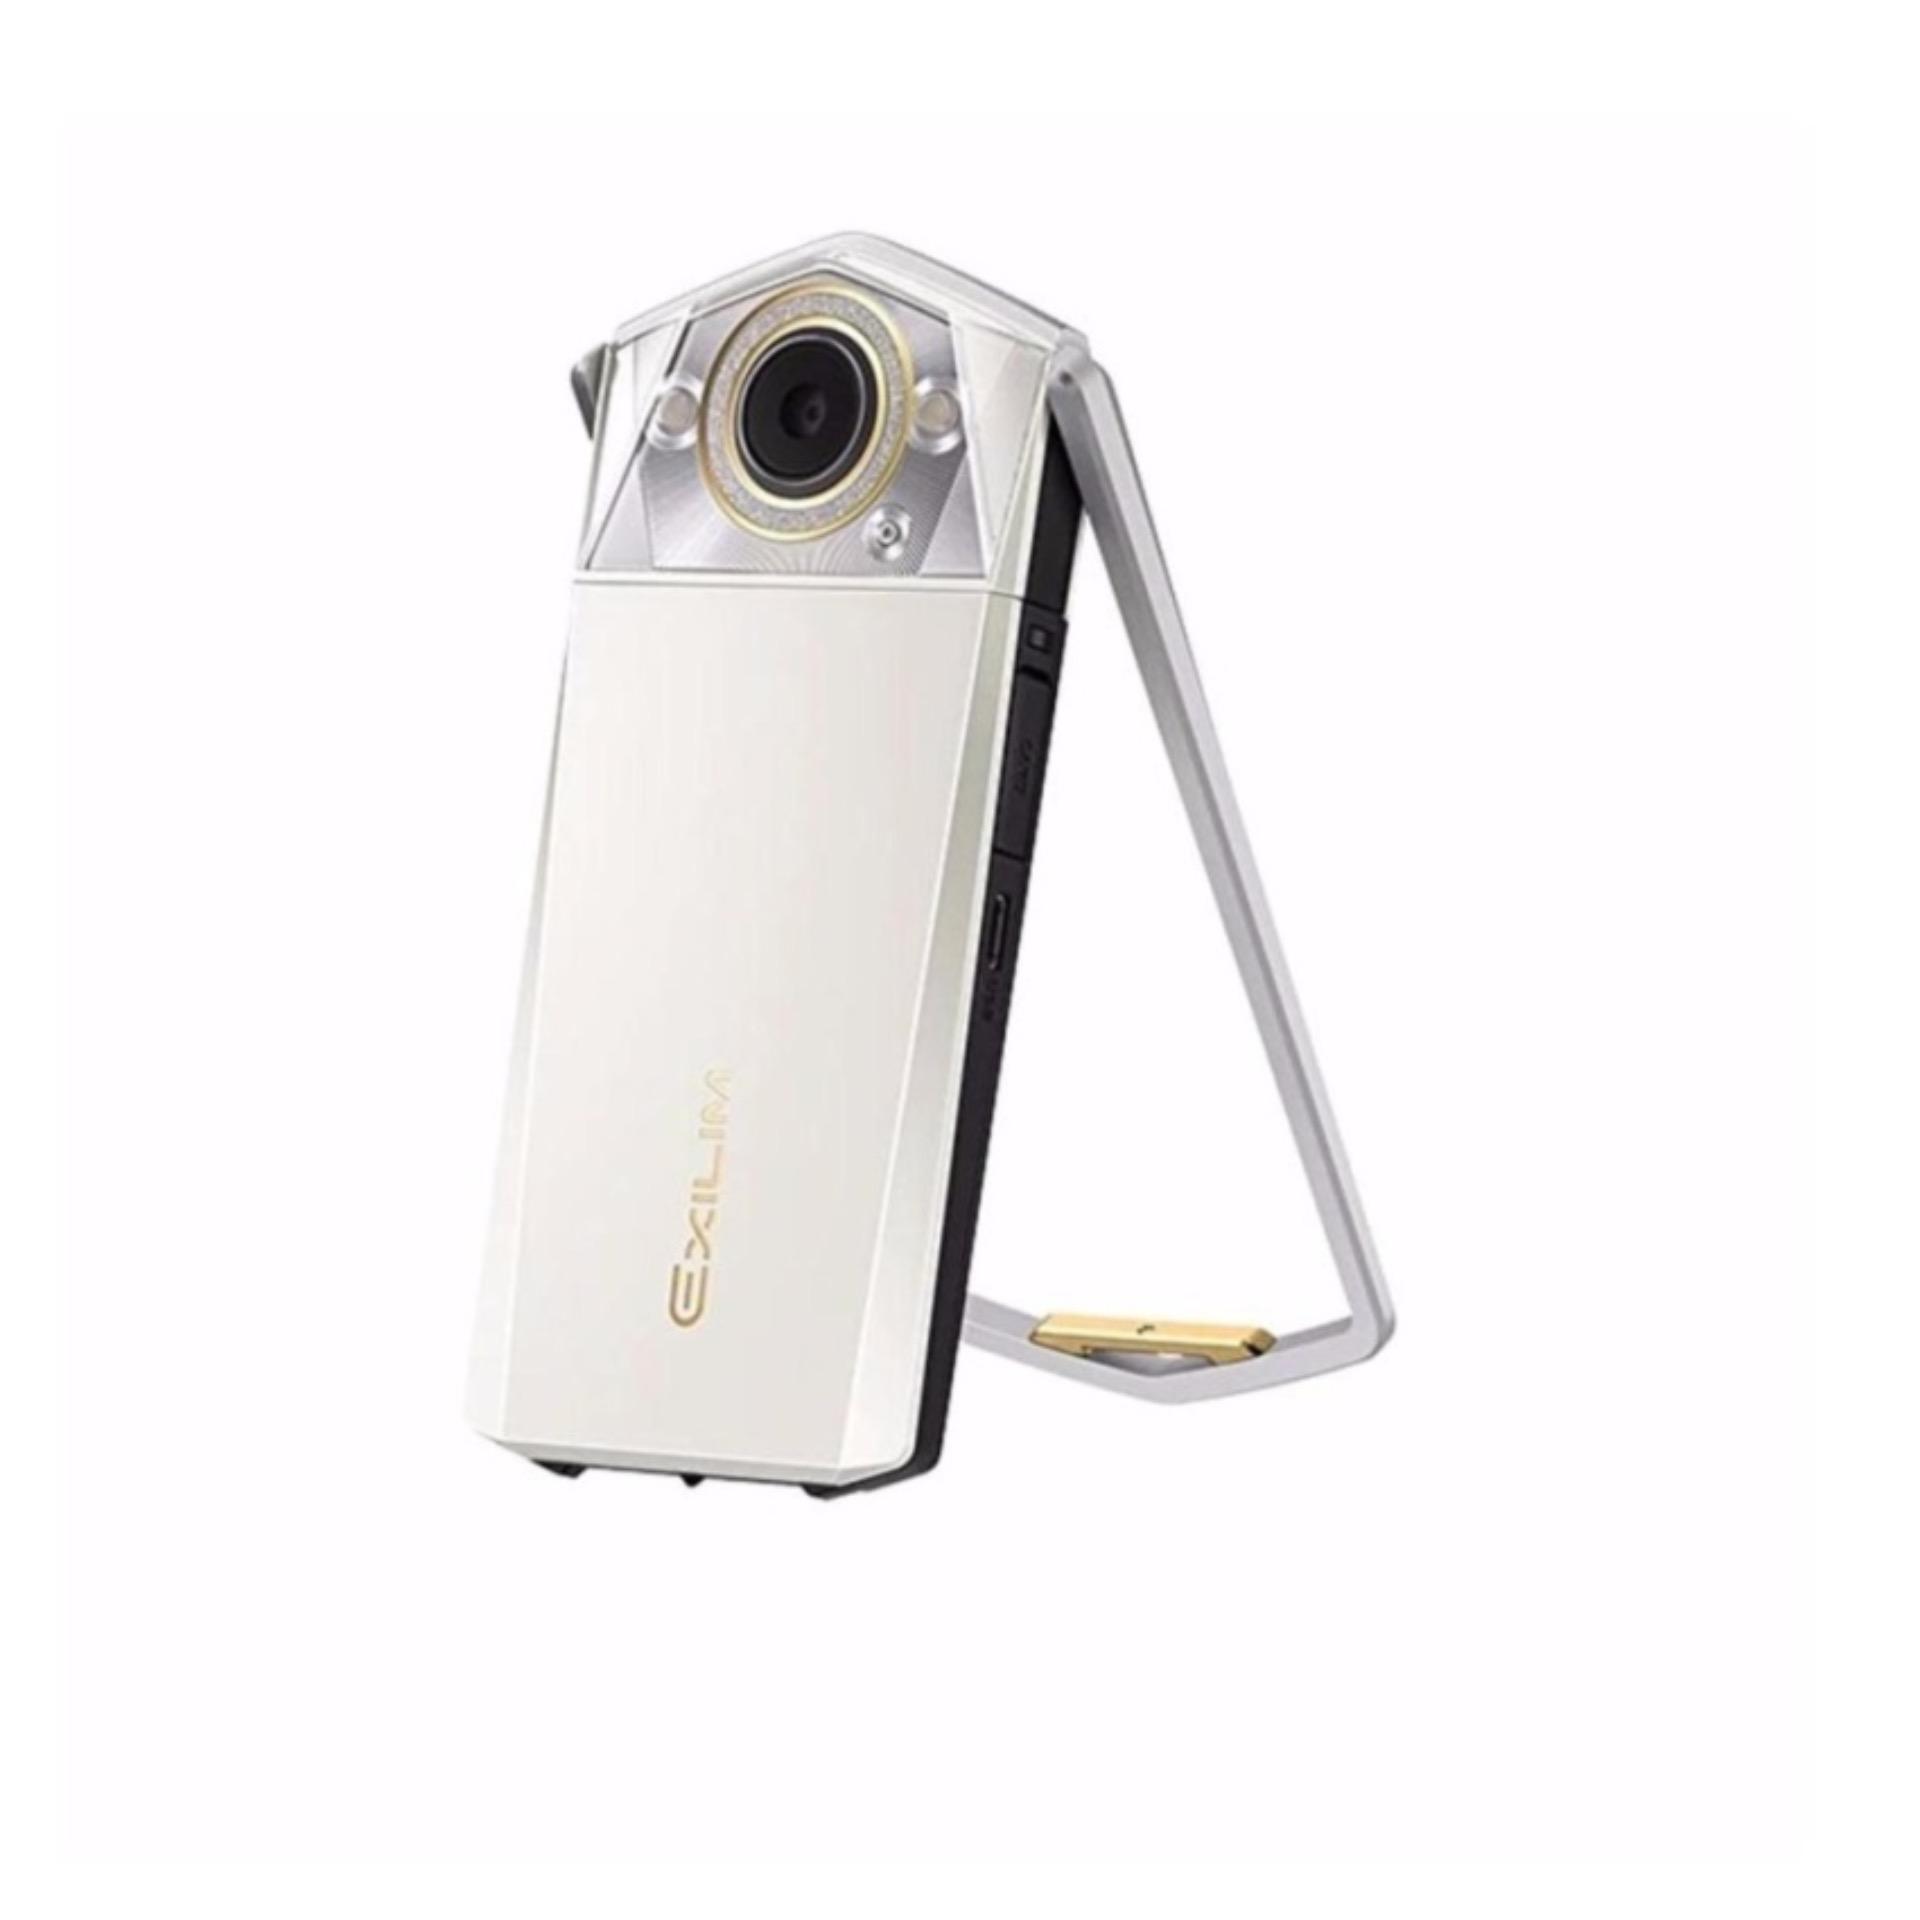 Casio Exilim EX-TR80 (White) Local 1 Year Warranty